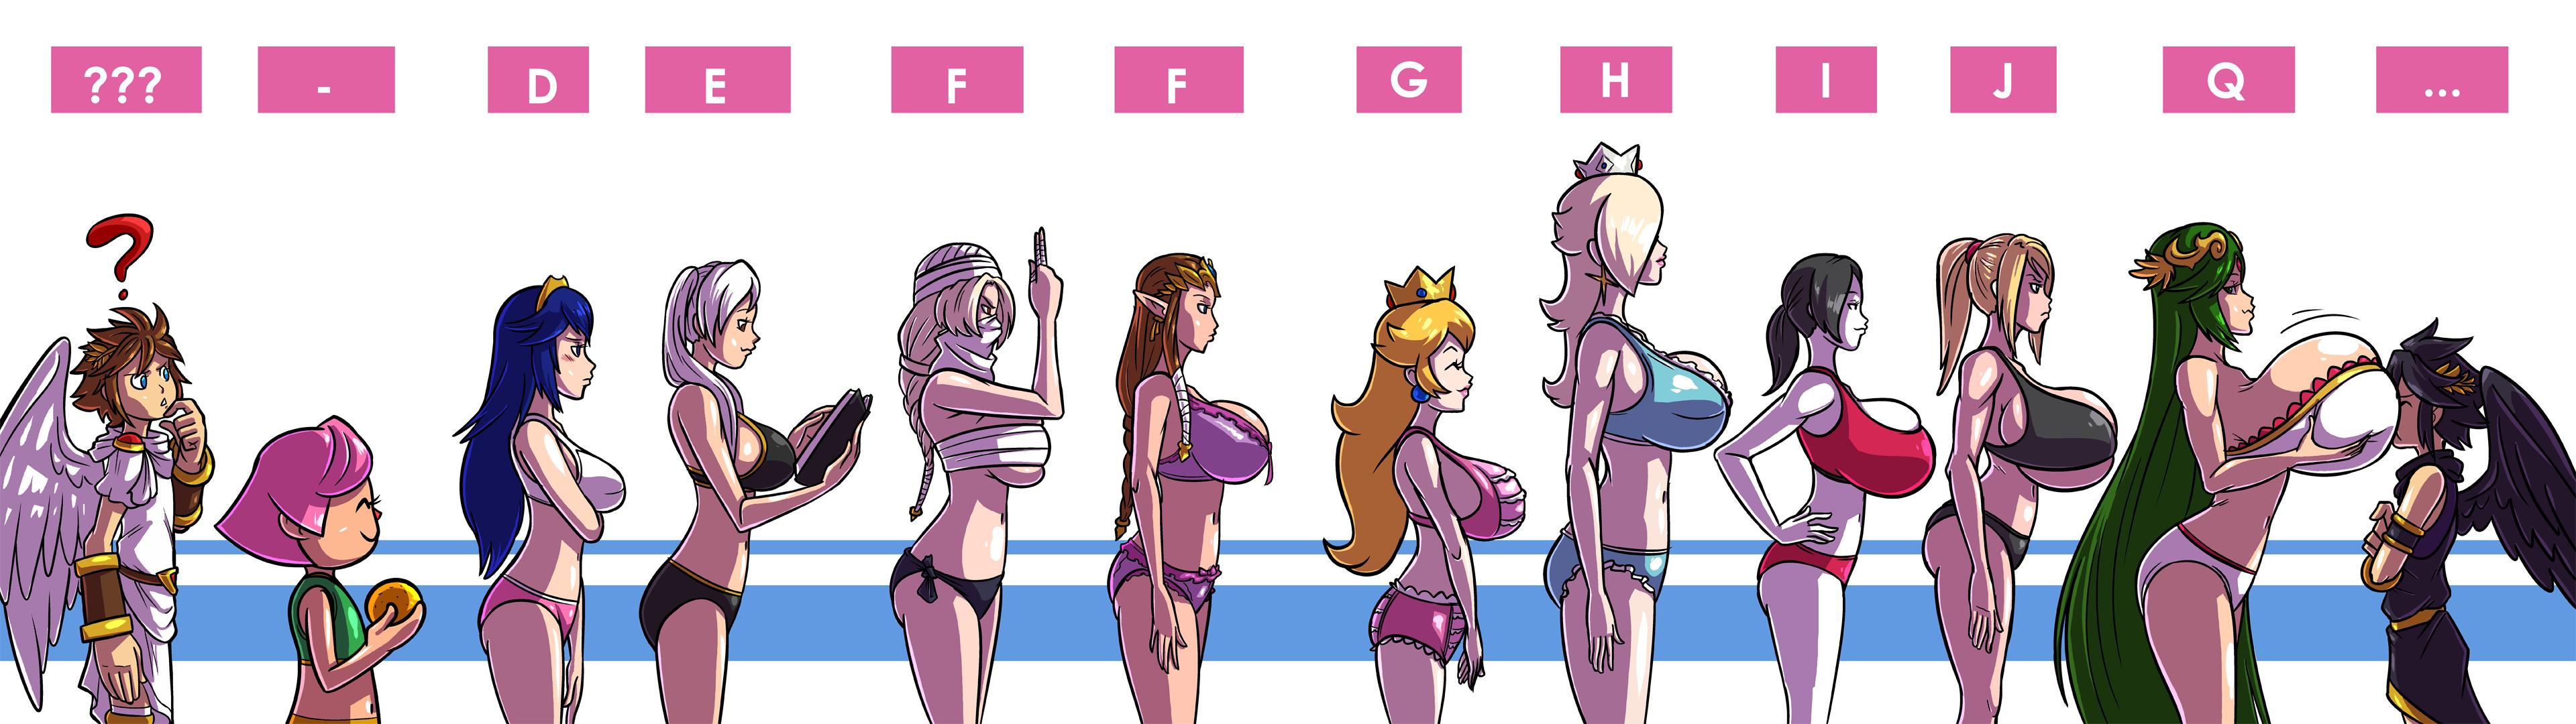 All boob size scale